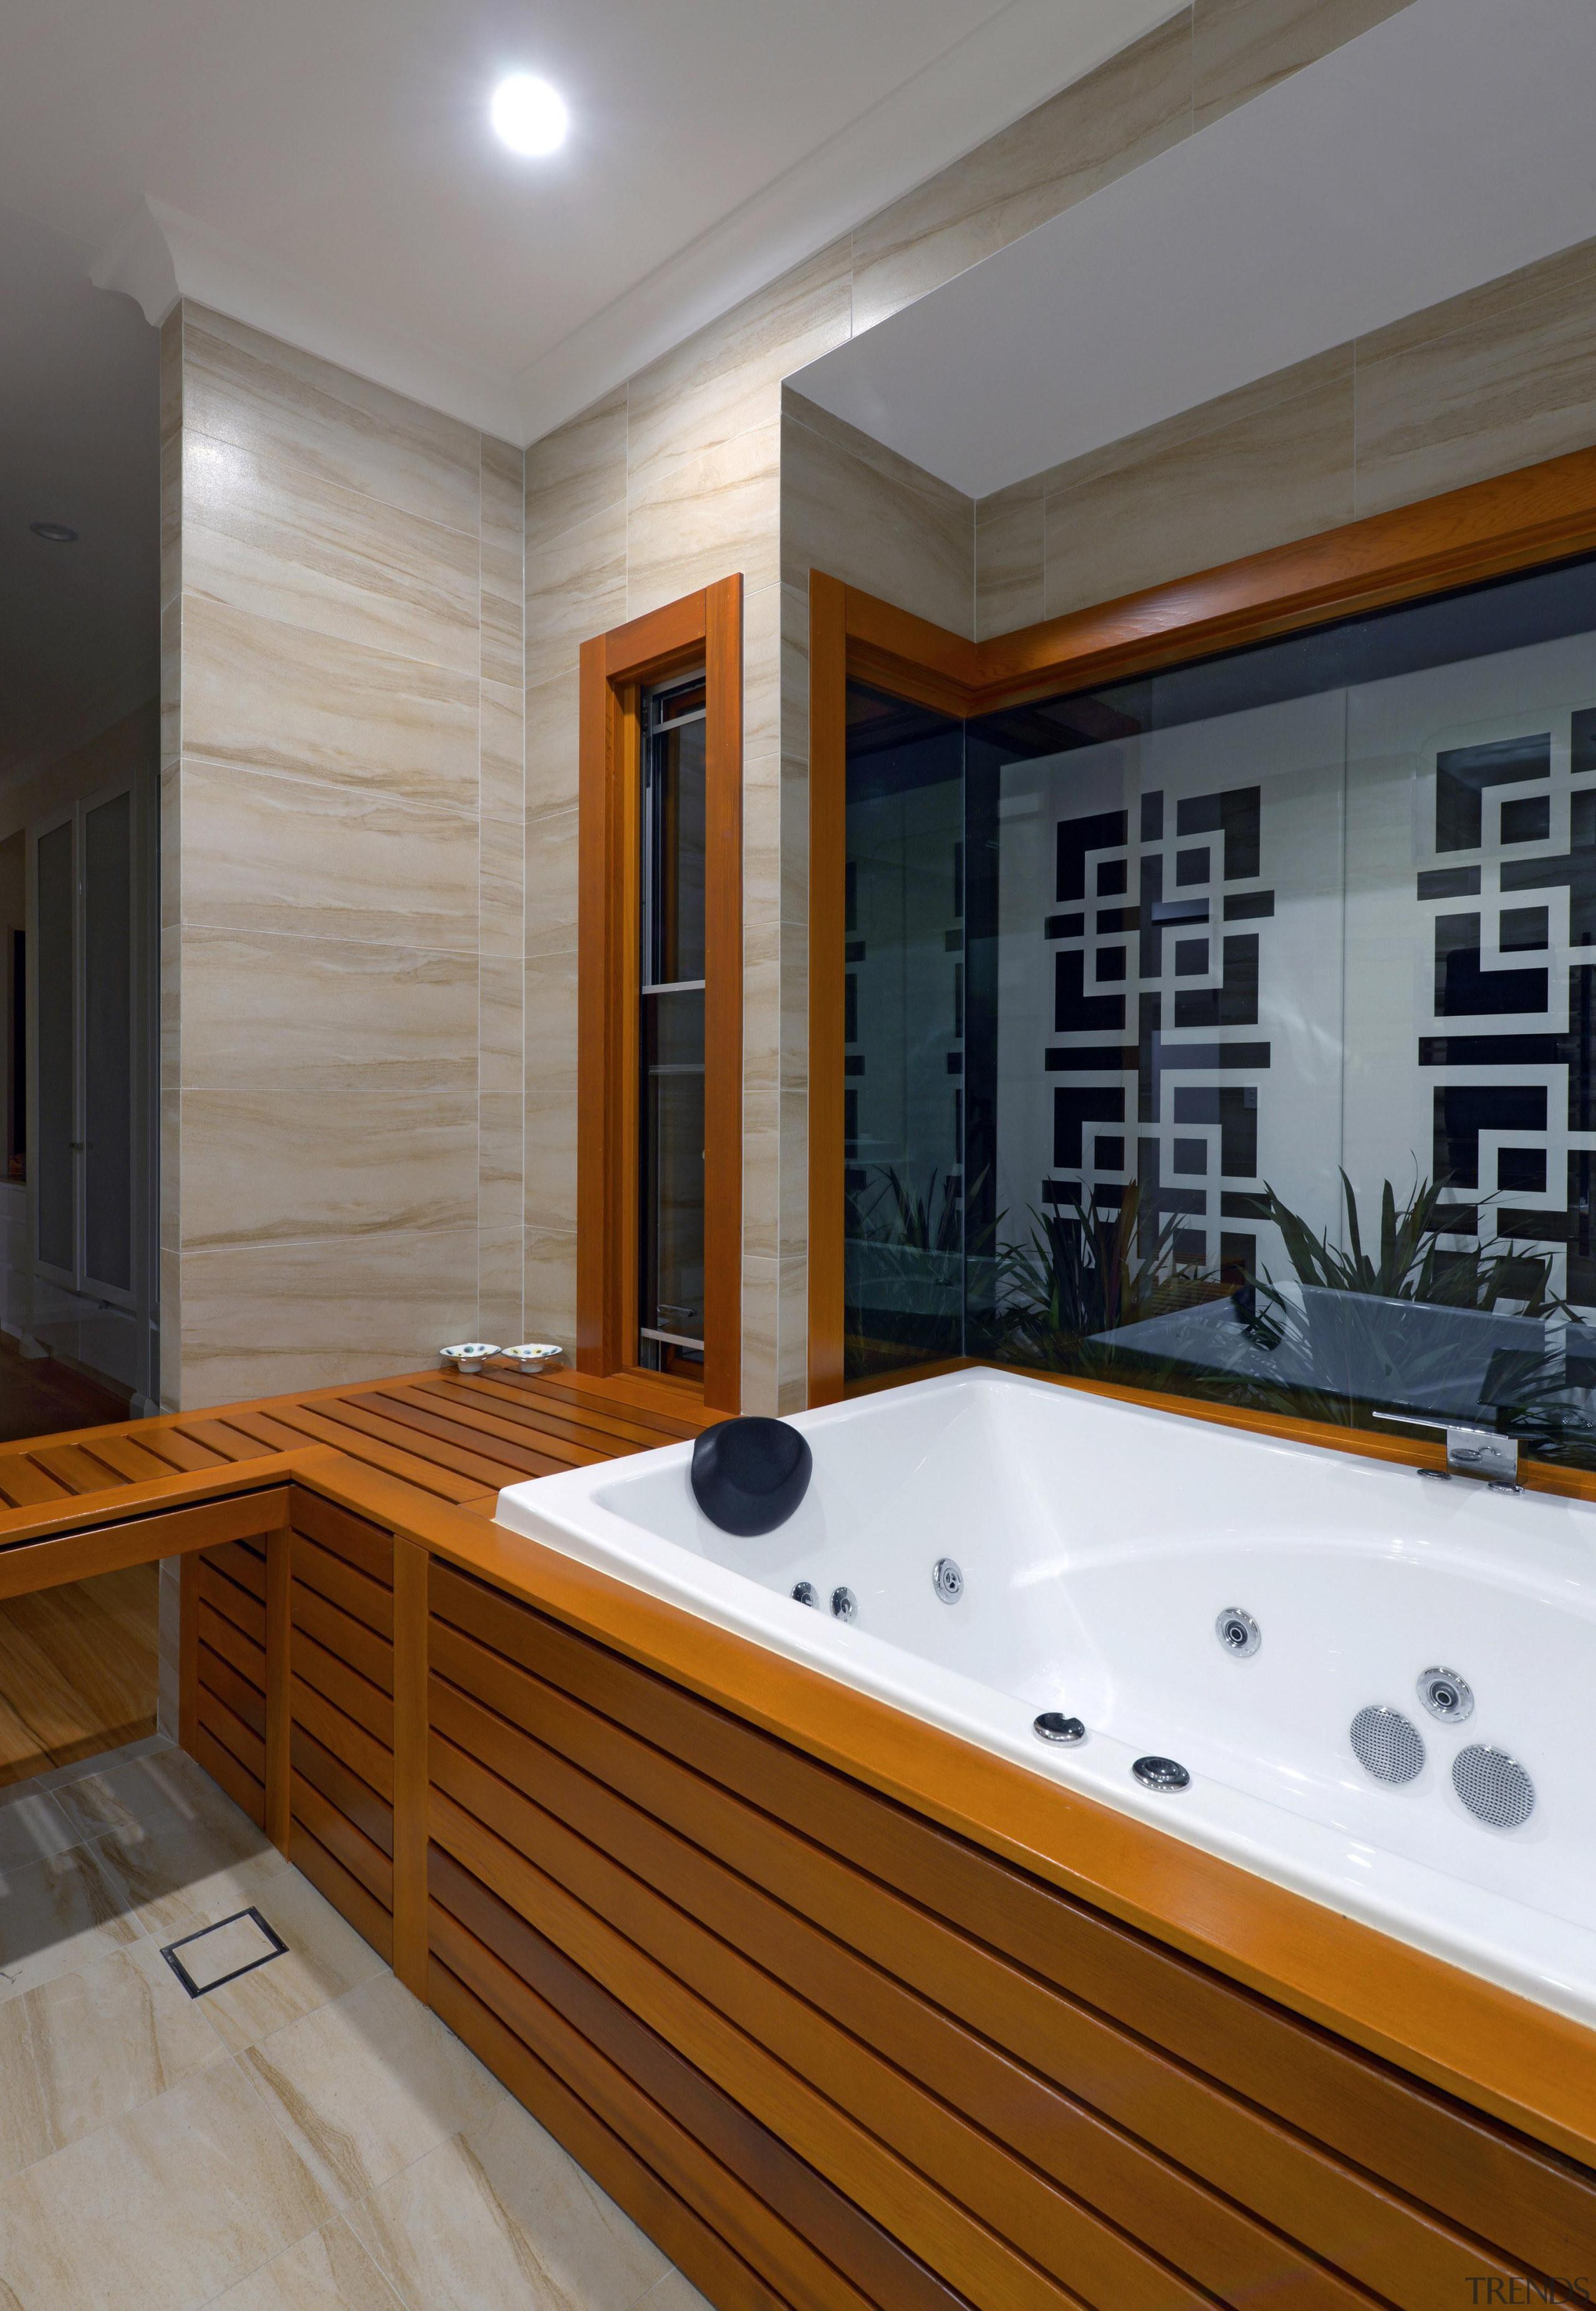 Winner Bathroom Design of the Year 2013 Hunter architecture, bathroom, bathtub, floor, interior design, room, gray, brown